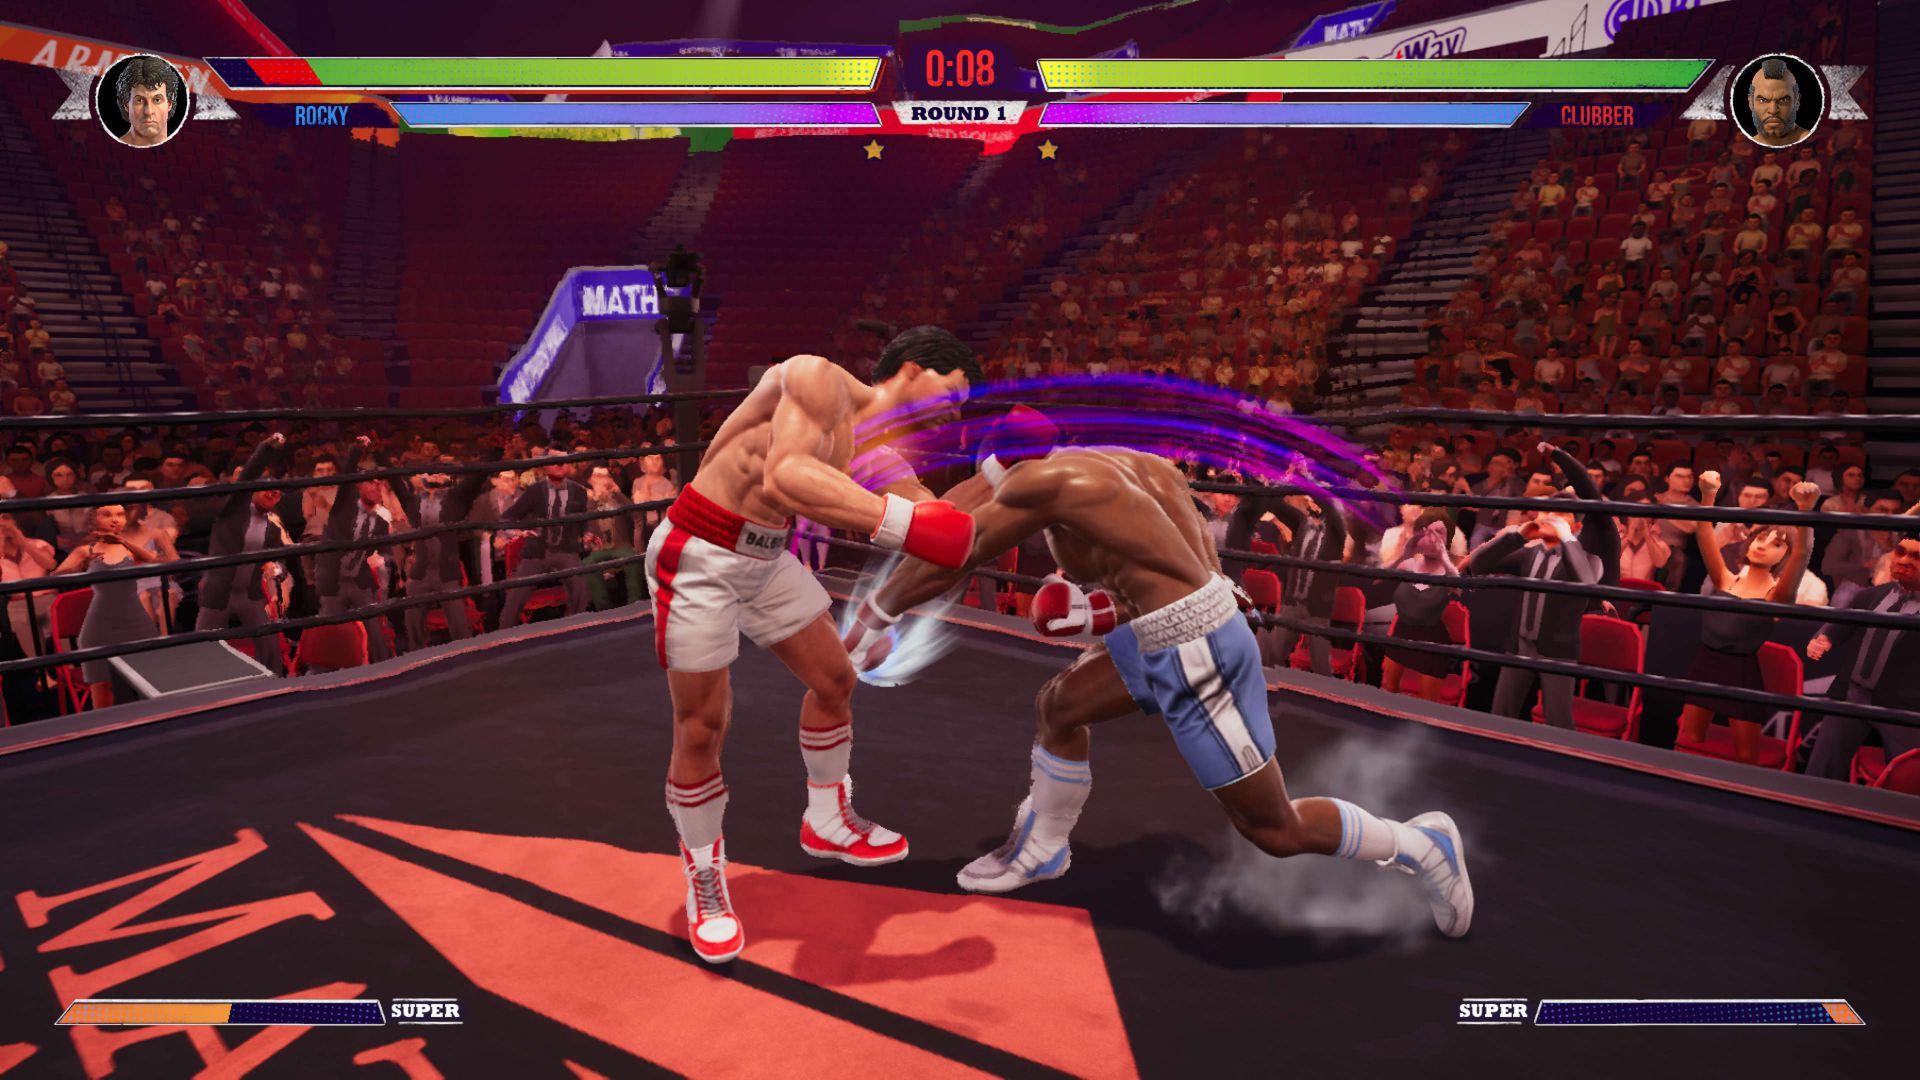 big rumble boxing creed champions 2 - generacion xbox